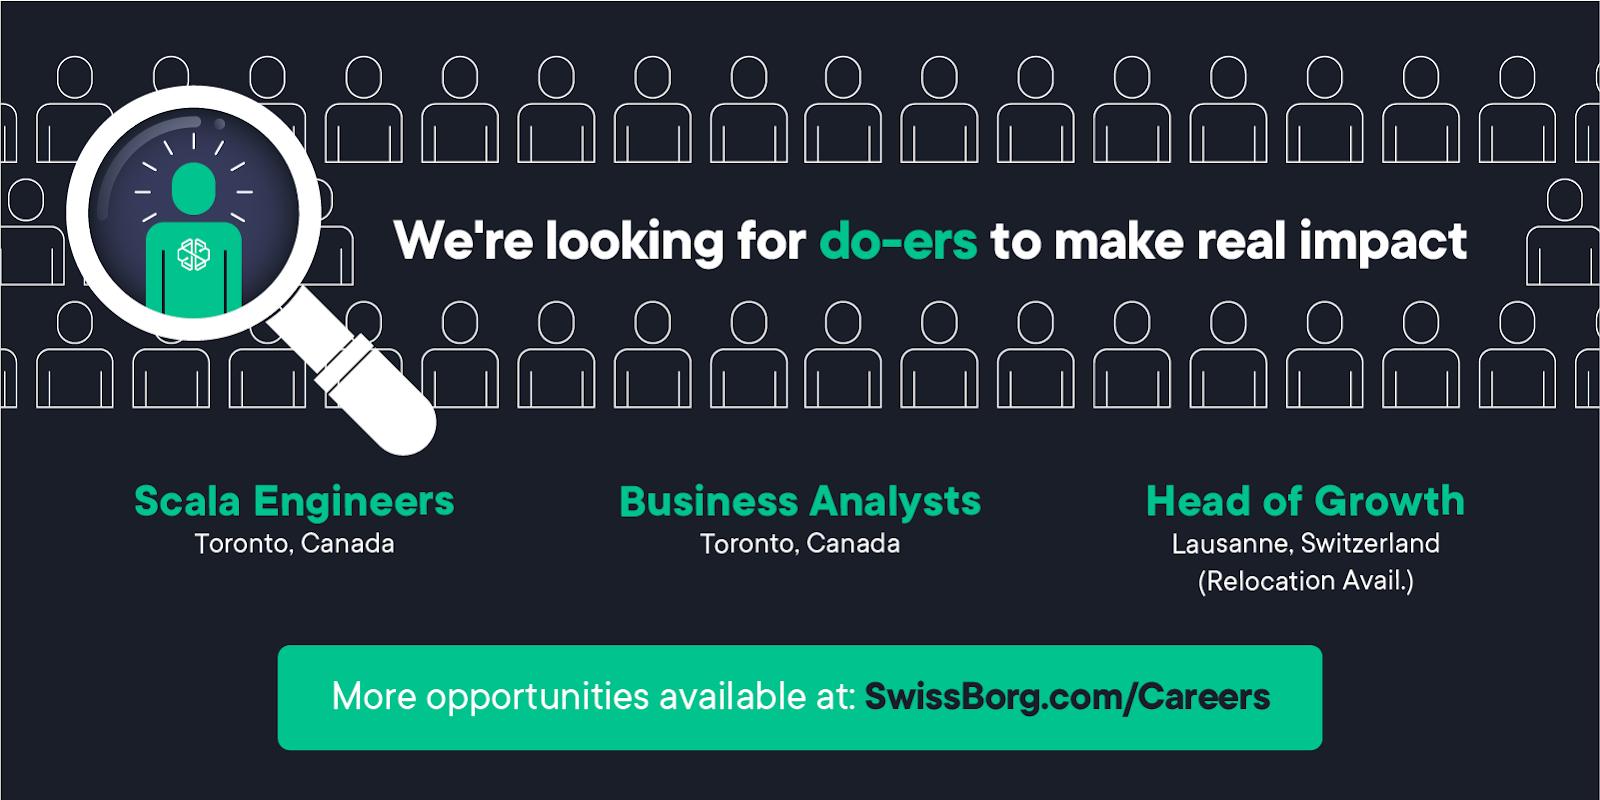 SwissBorg is hiring